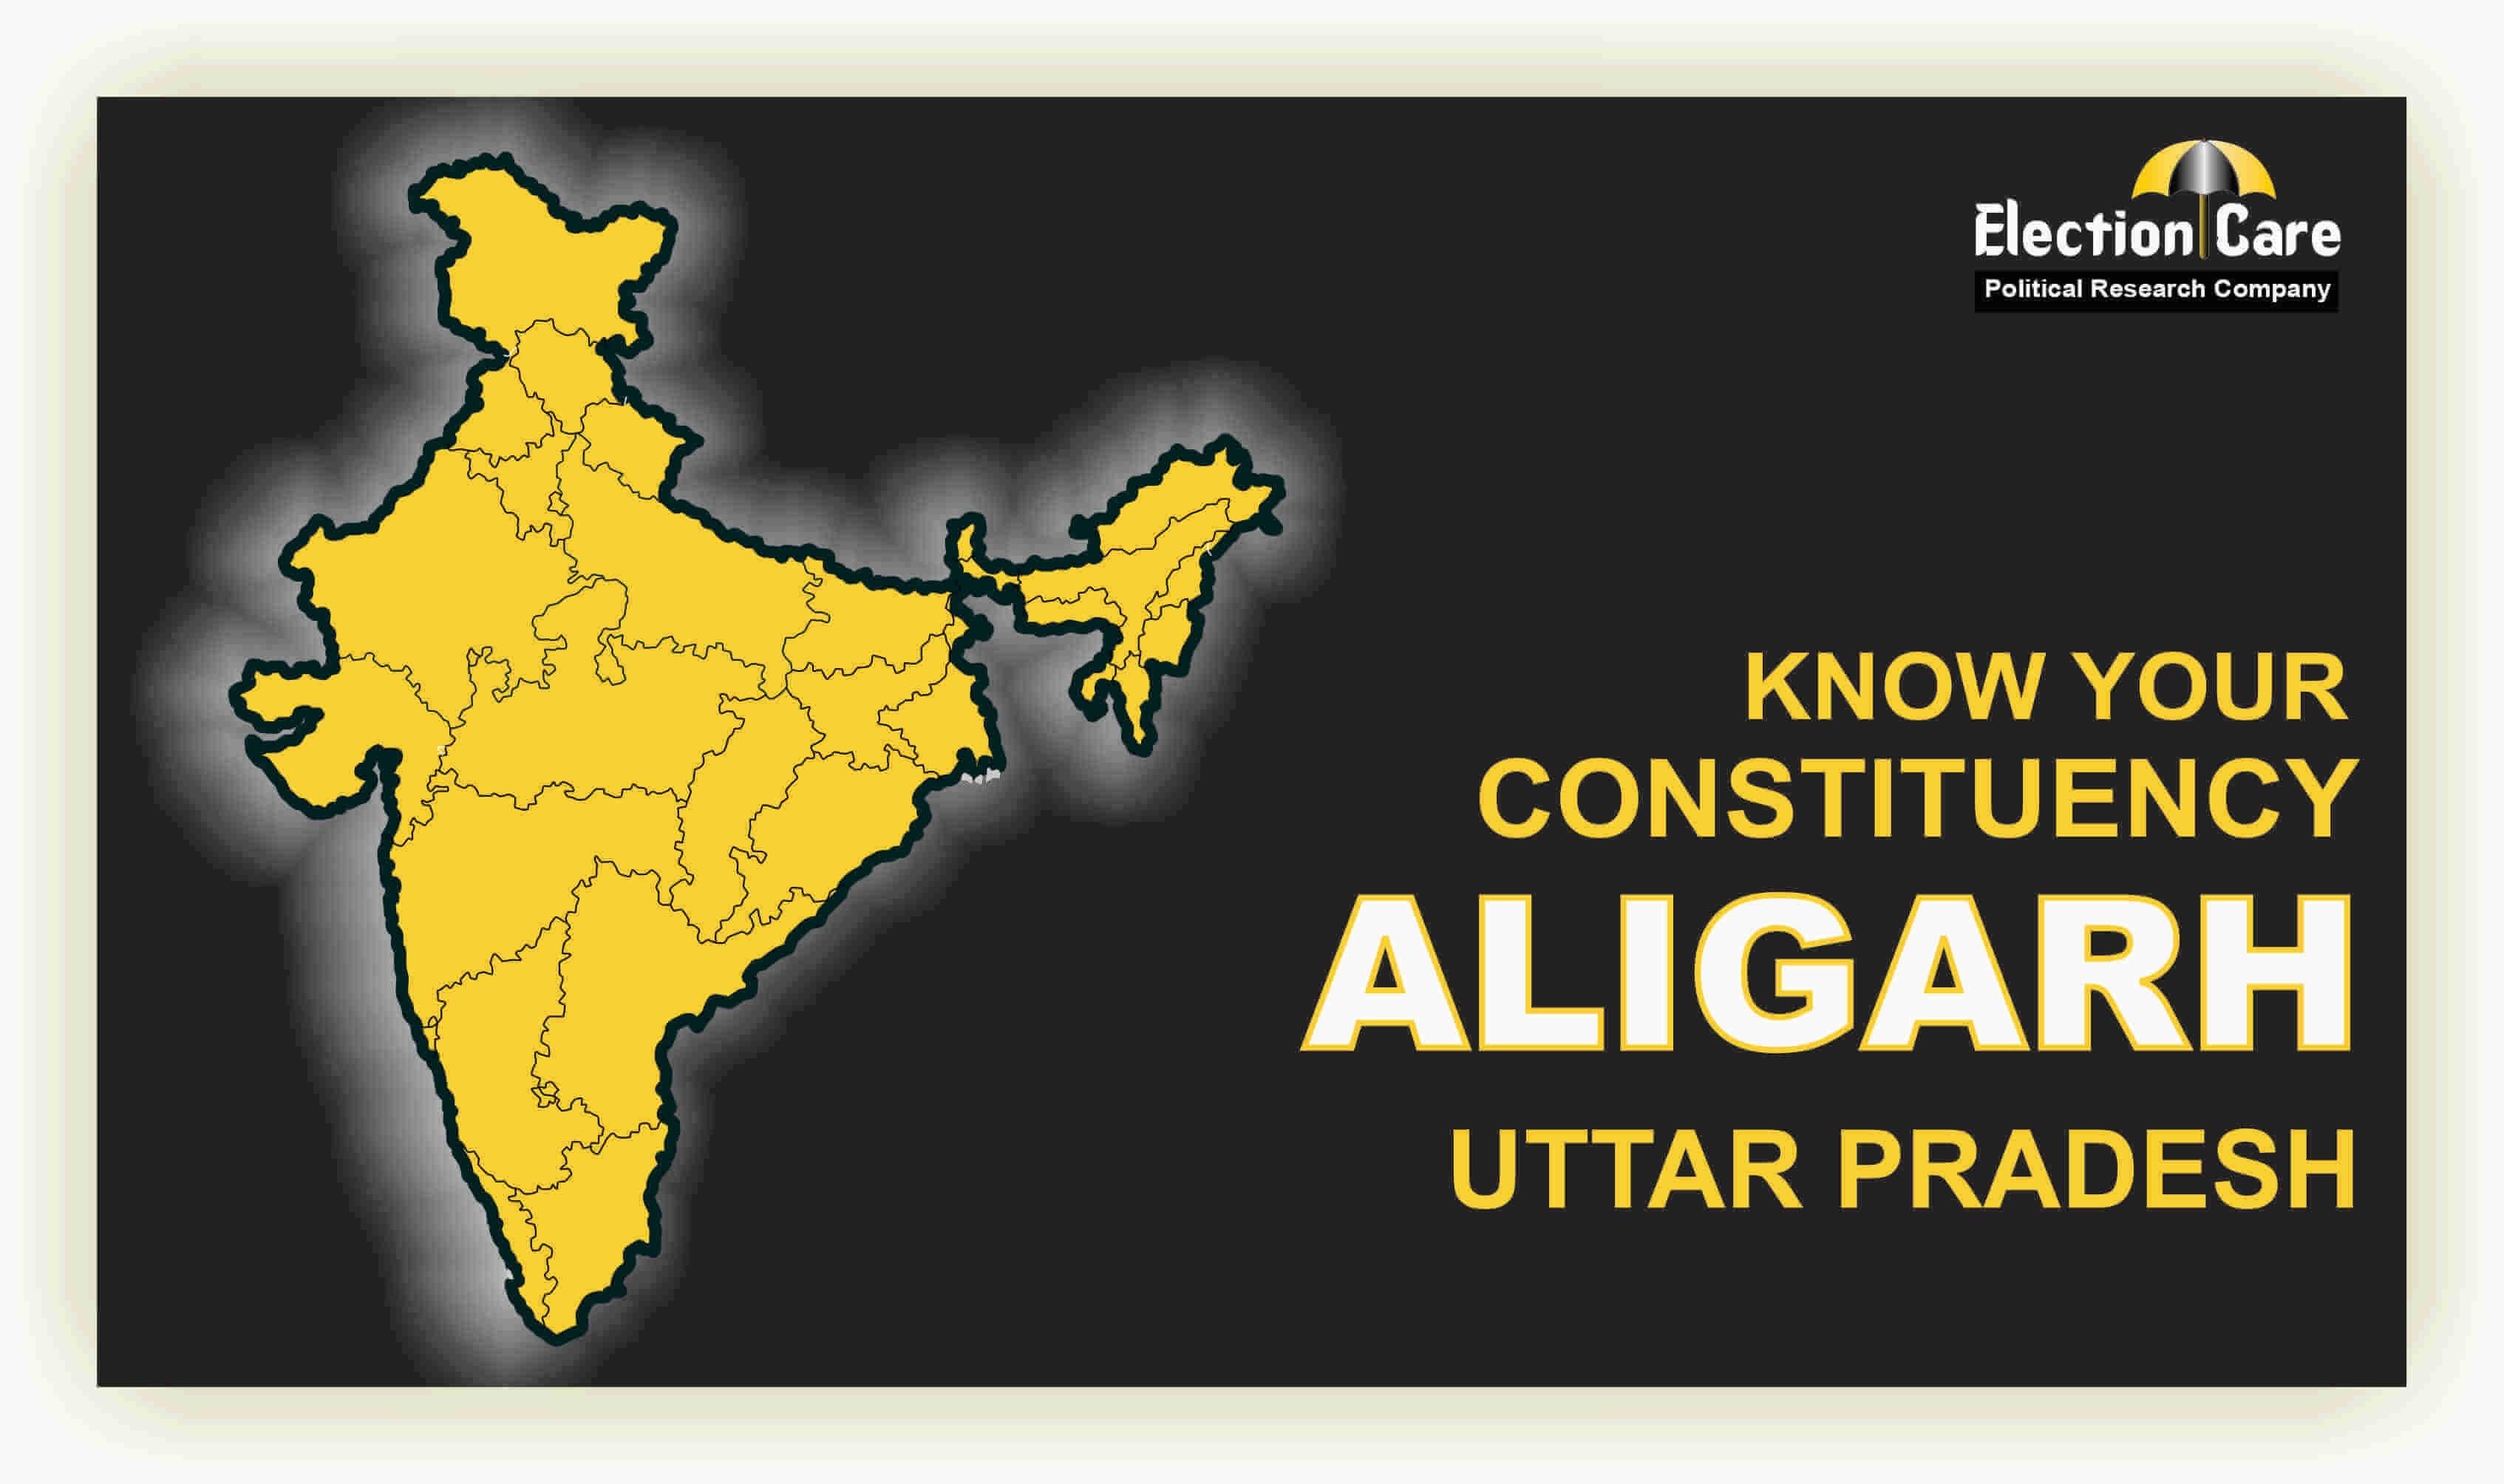 Aligarh Parliament Election Result